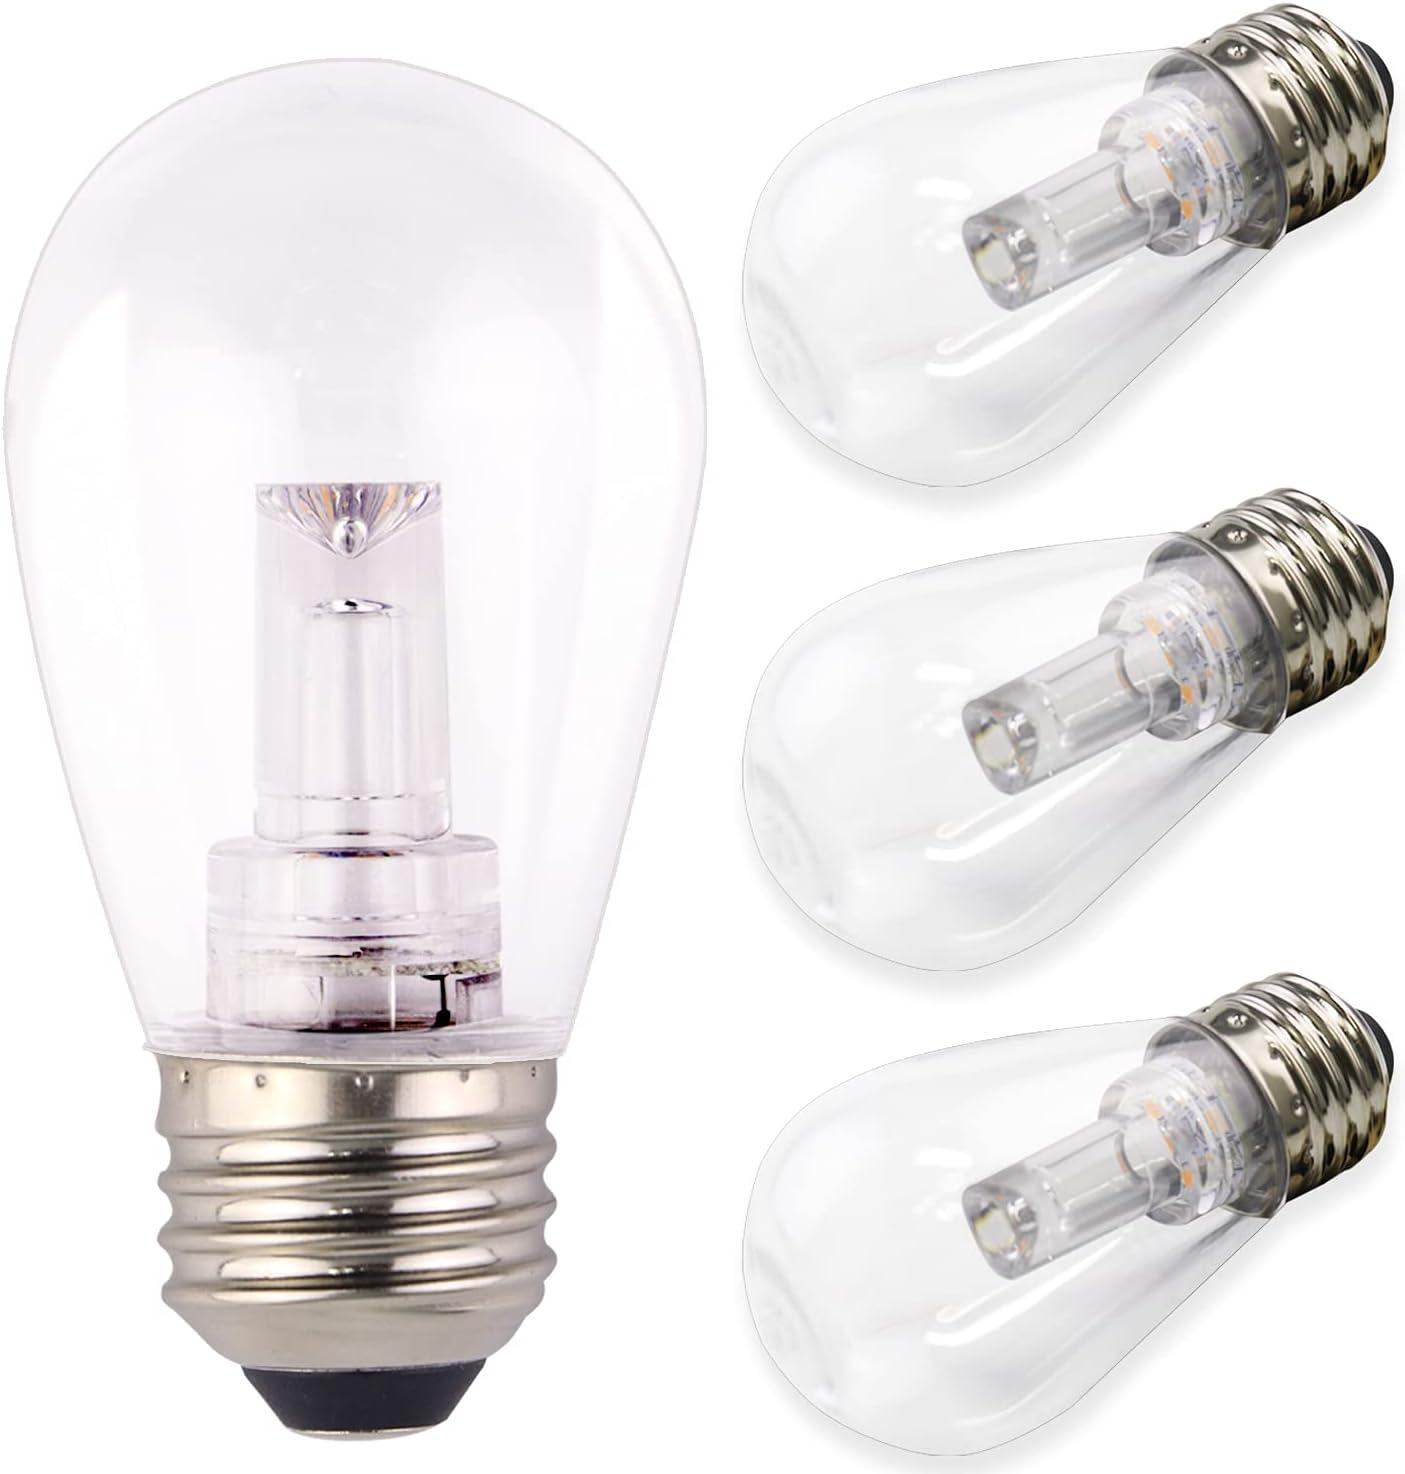 AVEVA Product 4 Pack LED S14 Temperature-95 Genuine Bulb Color Voltage-2100k 12V